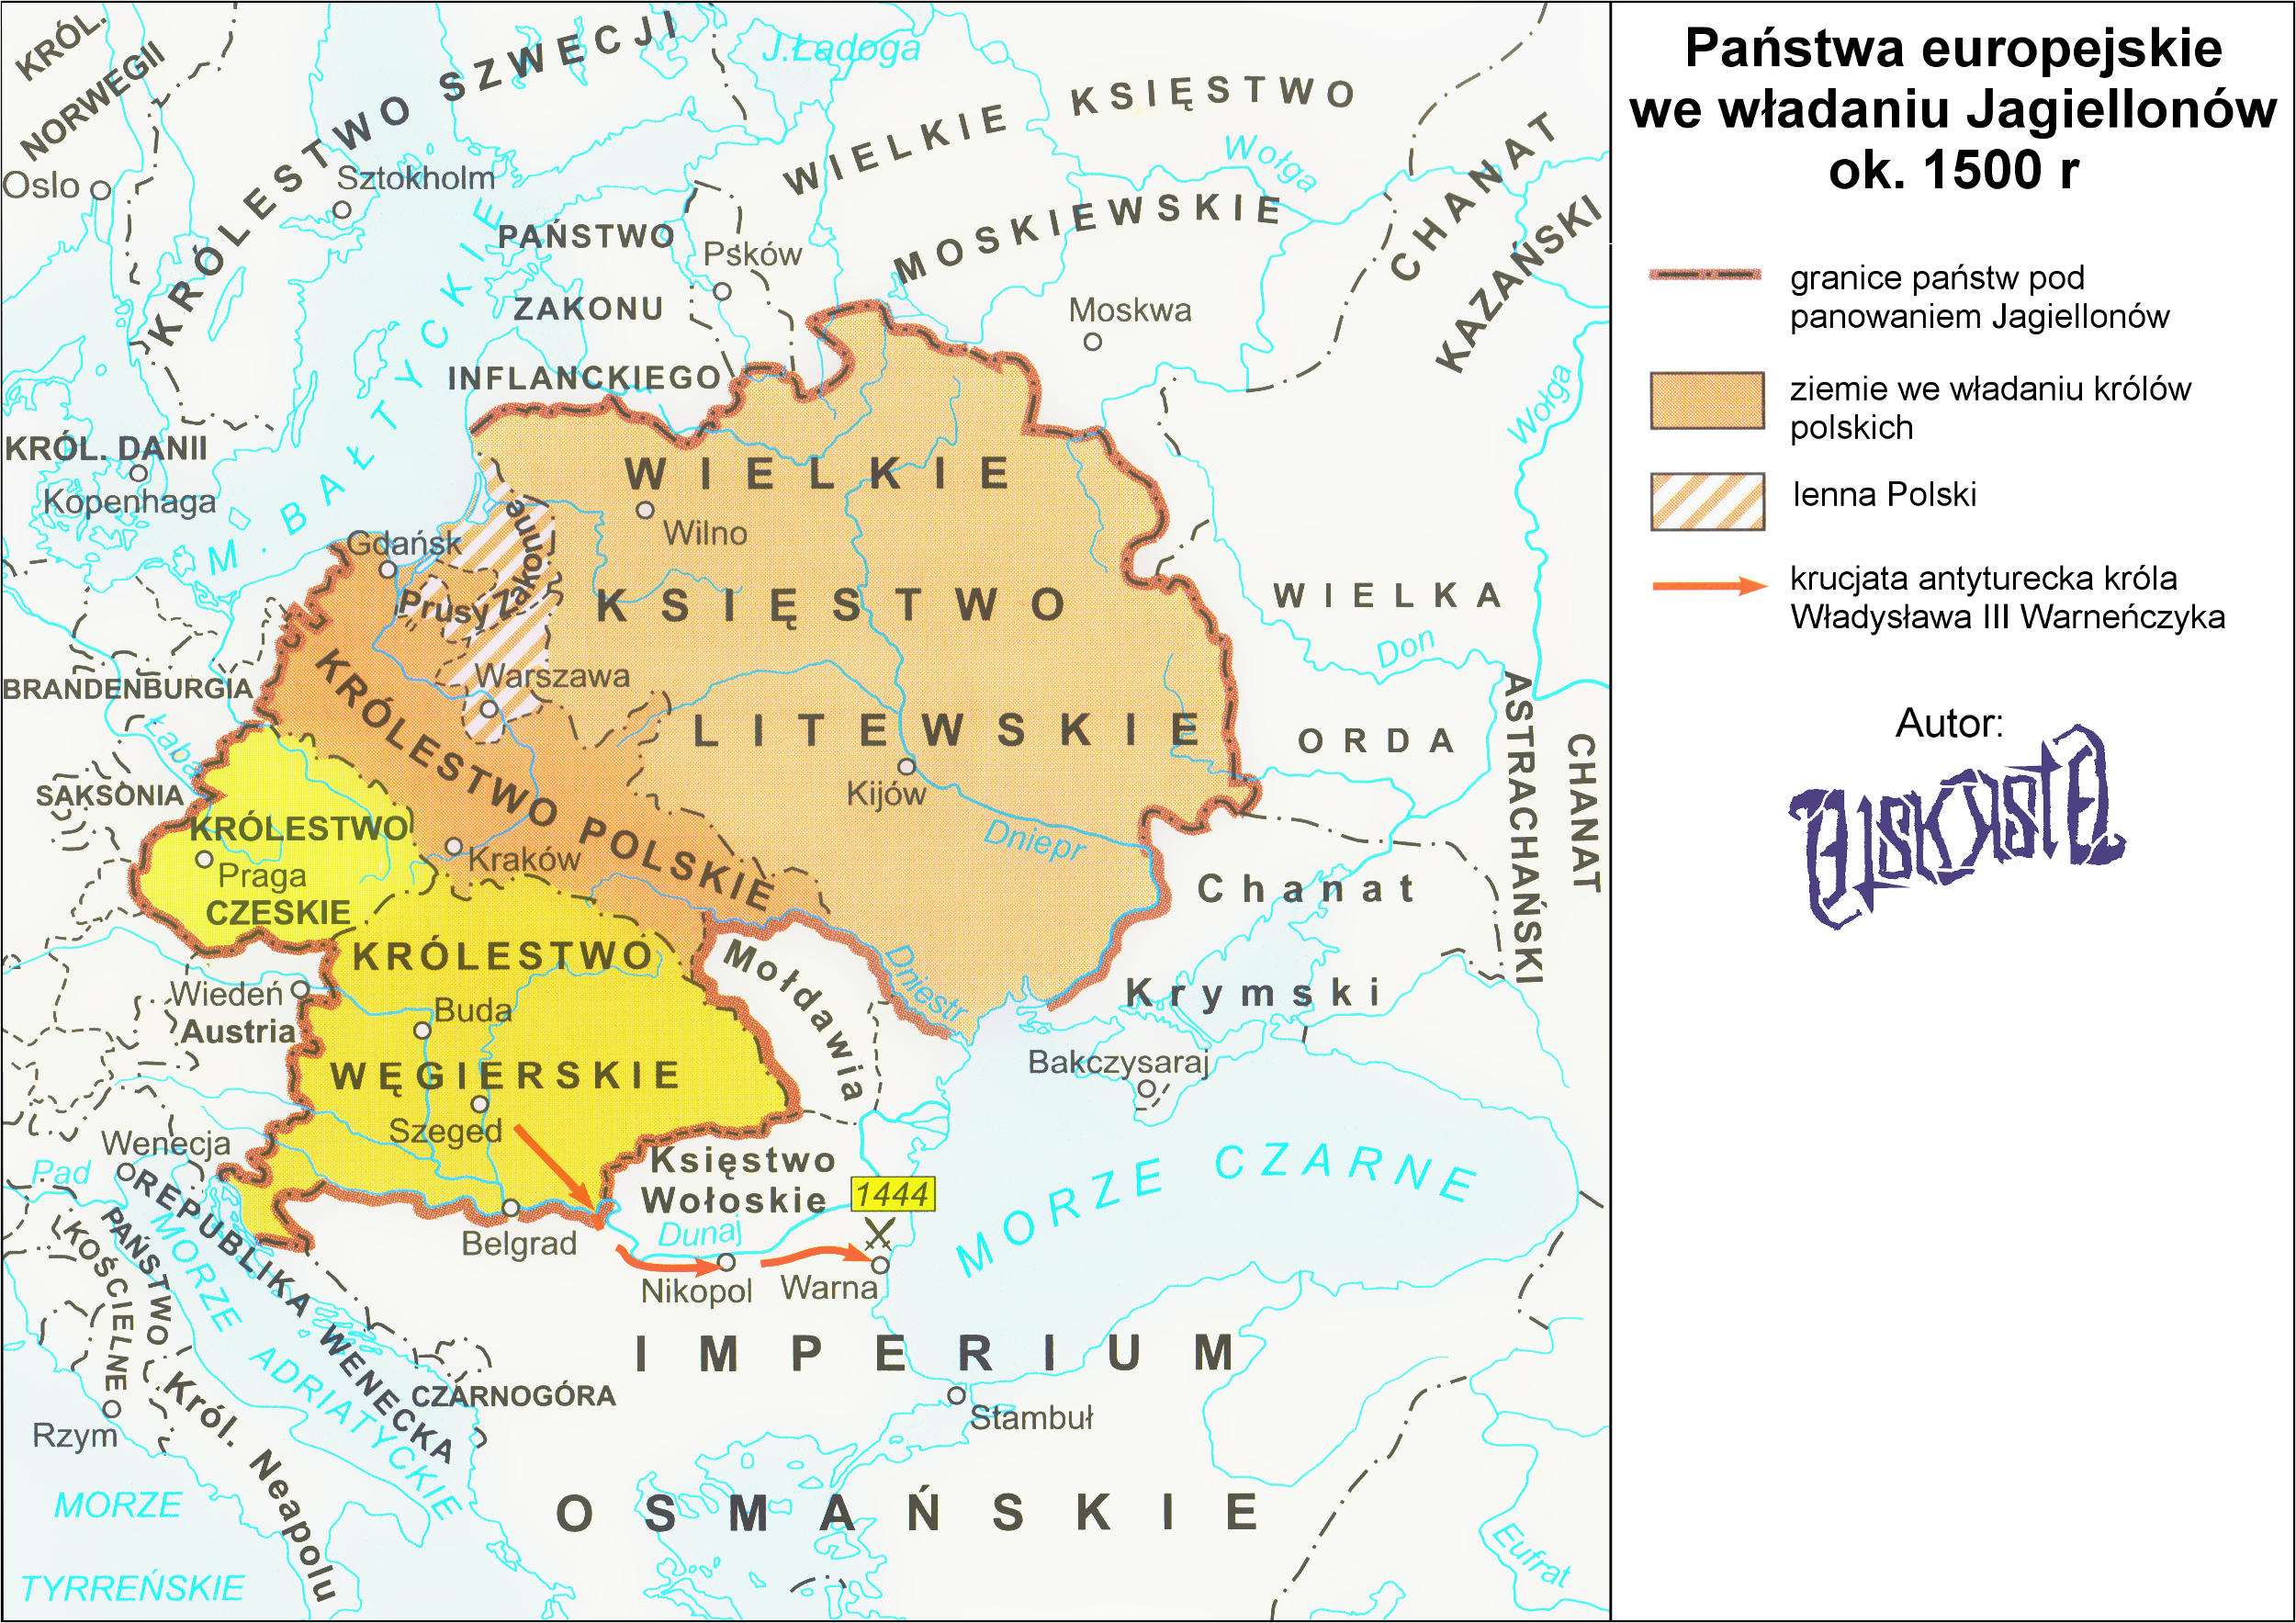 https://upload.wikimedia.org/wikipedia/commons/3/31/Jagiellonowie.png